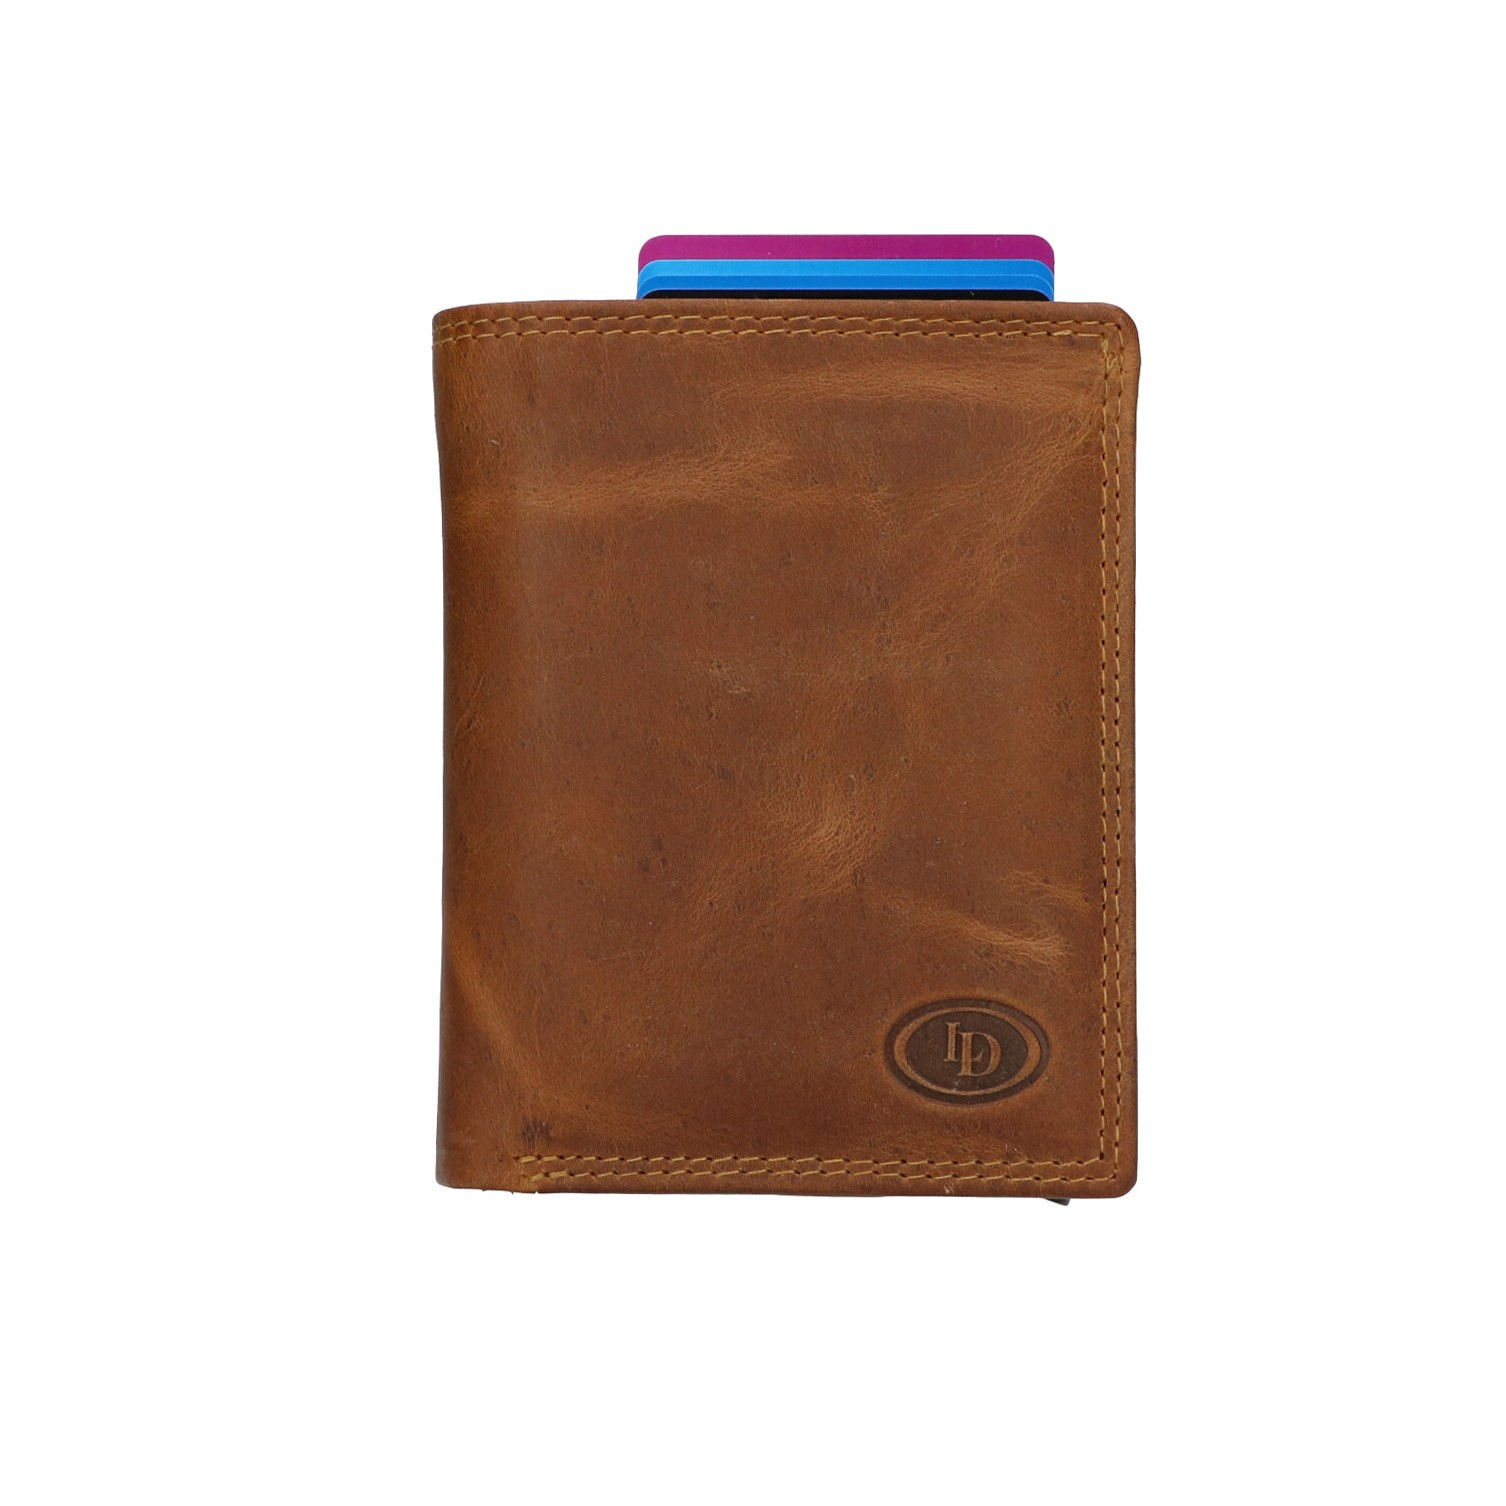 Leather Design Billfold voor Cardprotector HU 2723 Bruin